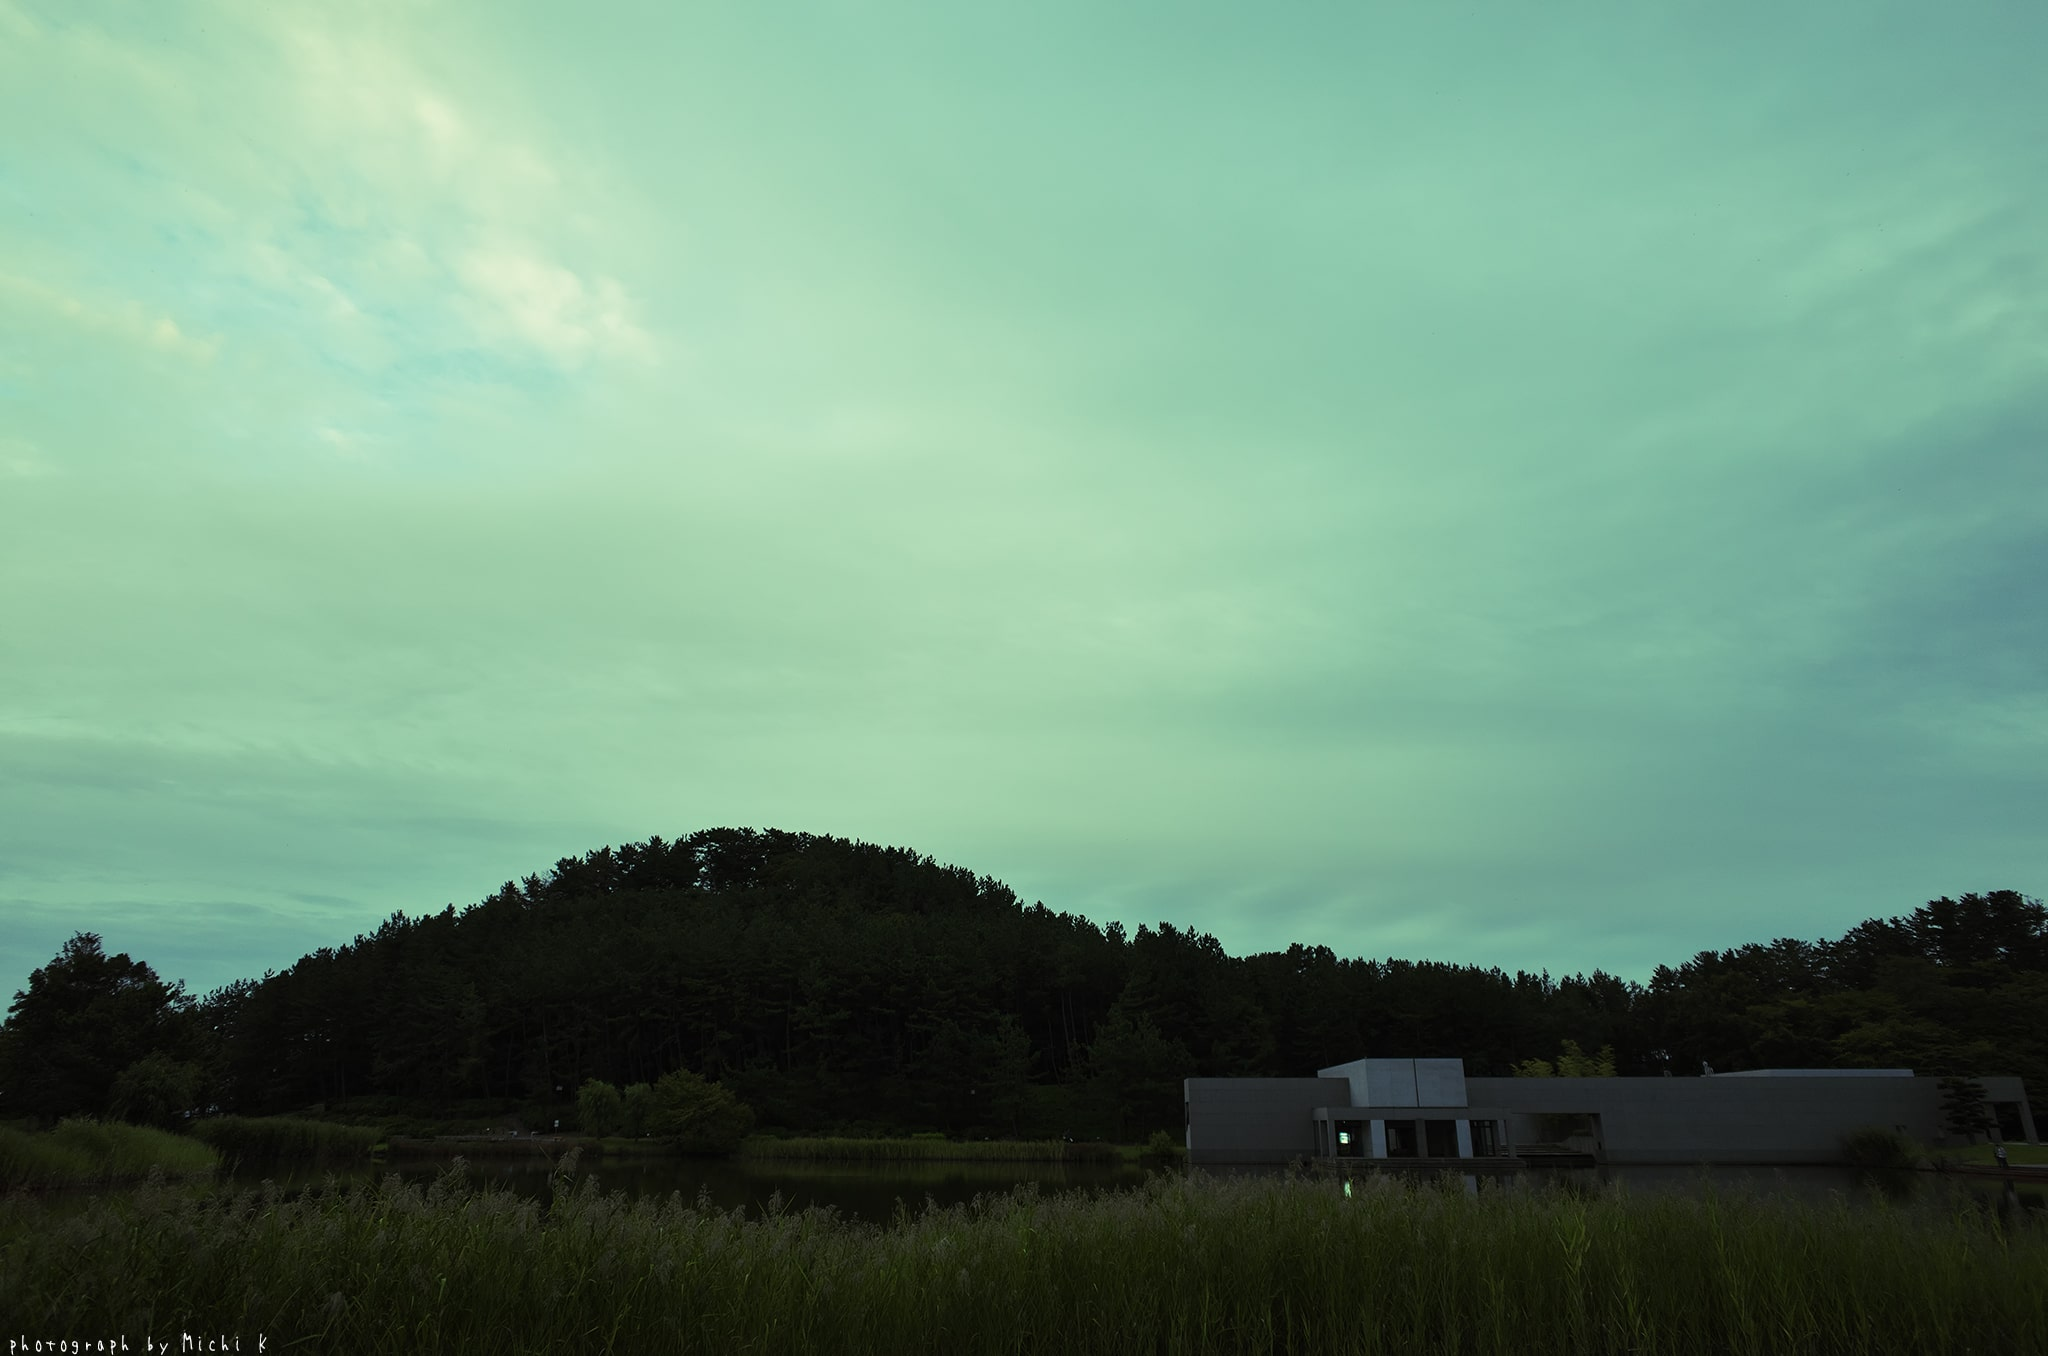 土門拳記念館2019-9-21夕方(写真その5)